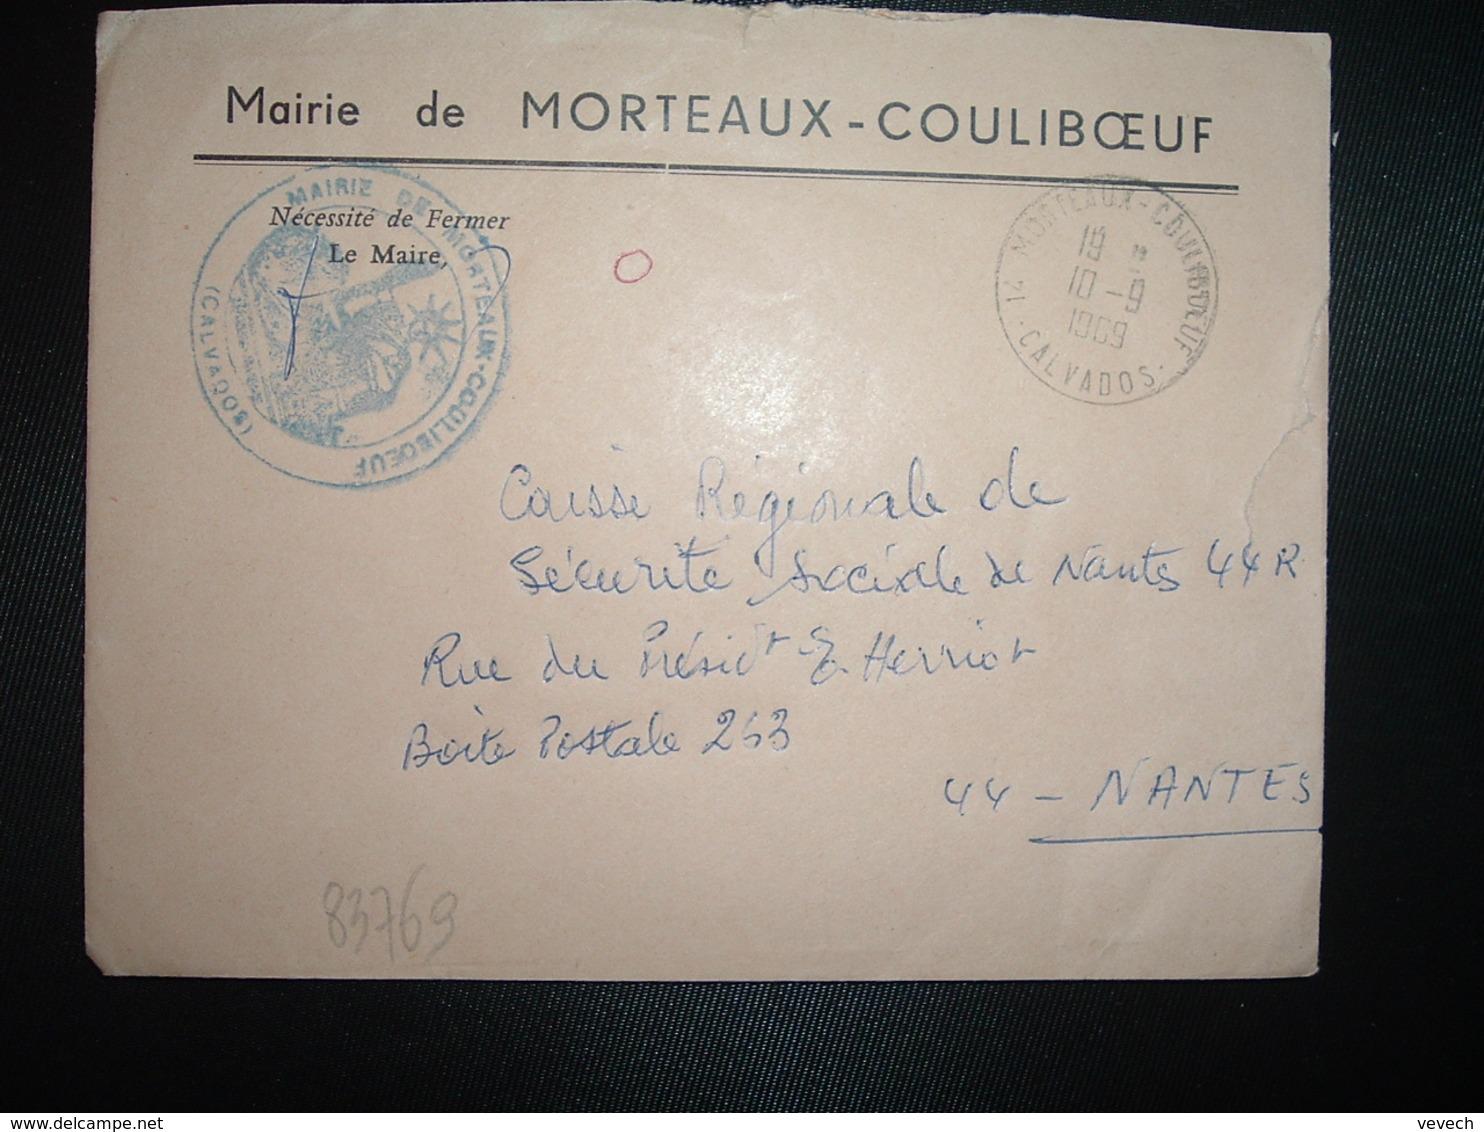 LETTRE MAIRIE OBL.10-9 1969 14 MORTEAUX COULIBOEUF CALVADOS - Marcophilie (Lettres)